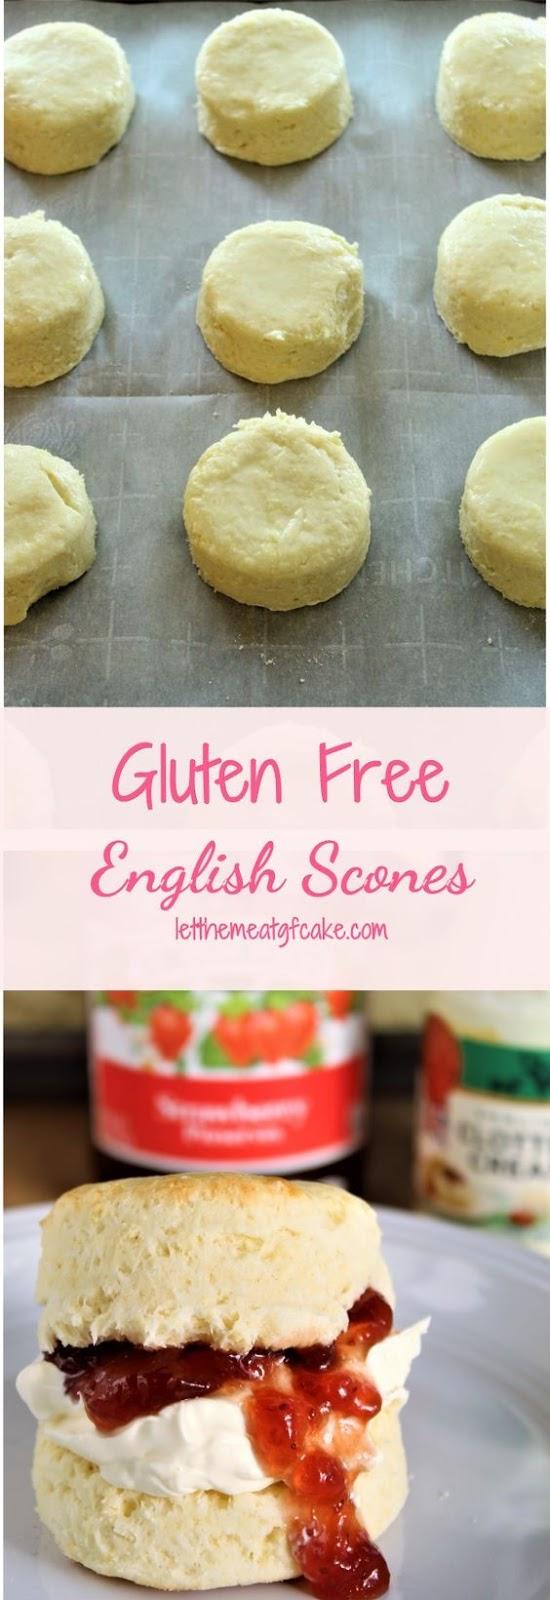 Gluten Free English Scones